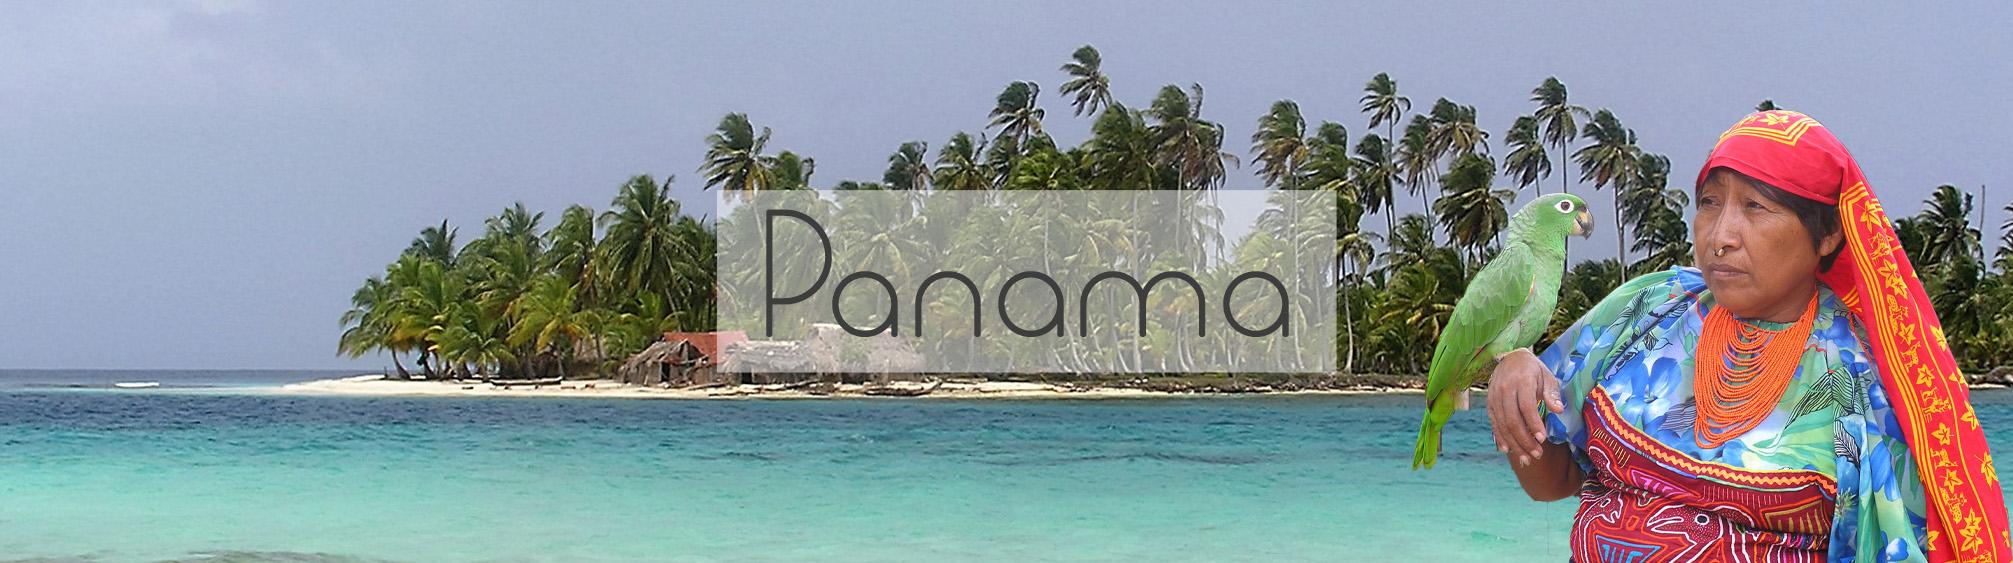 Reisinfo Panama